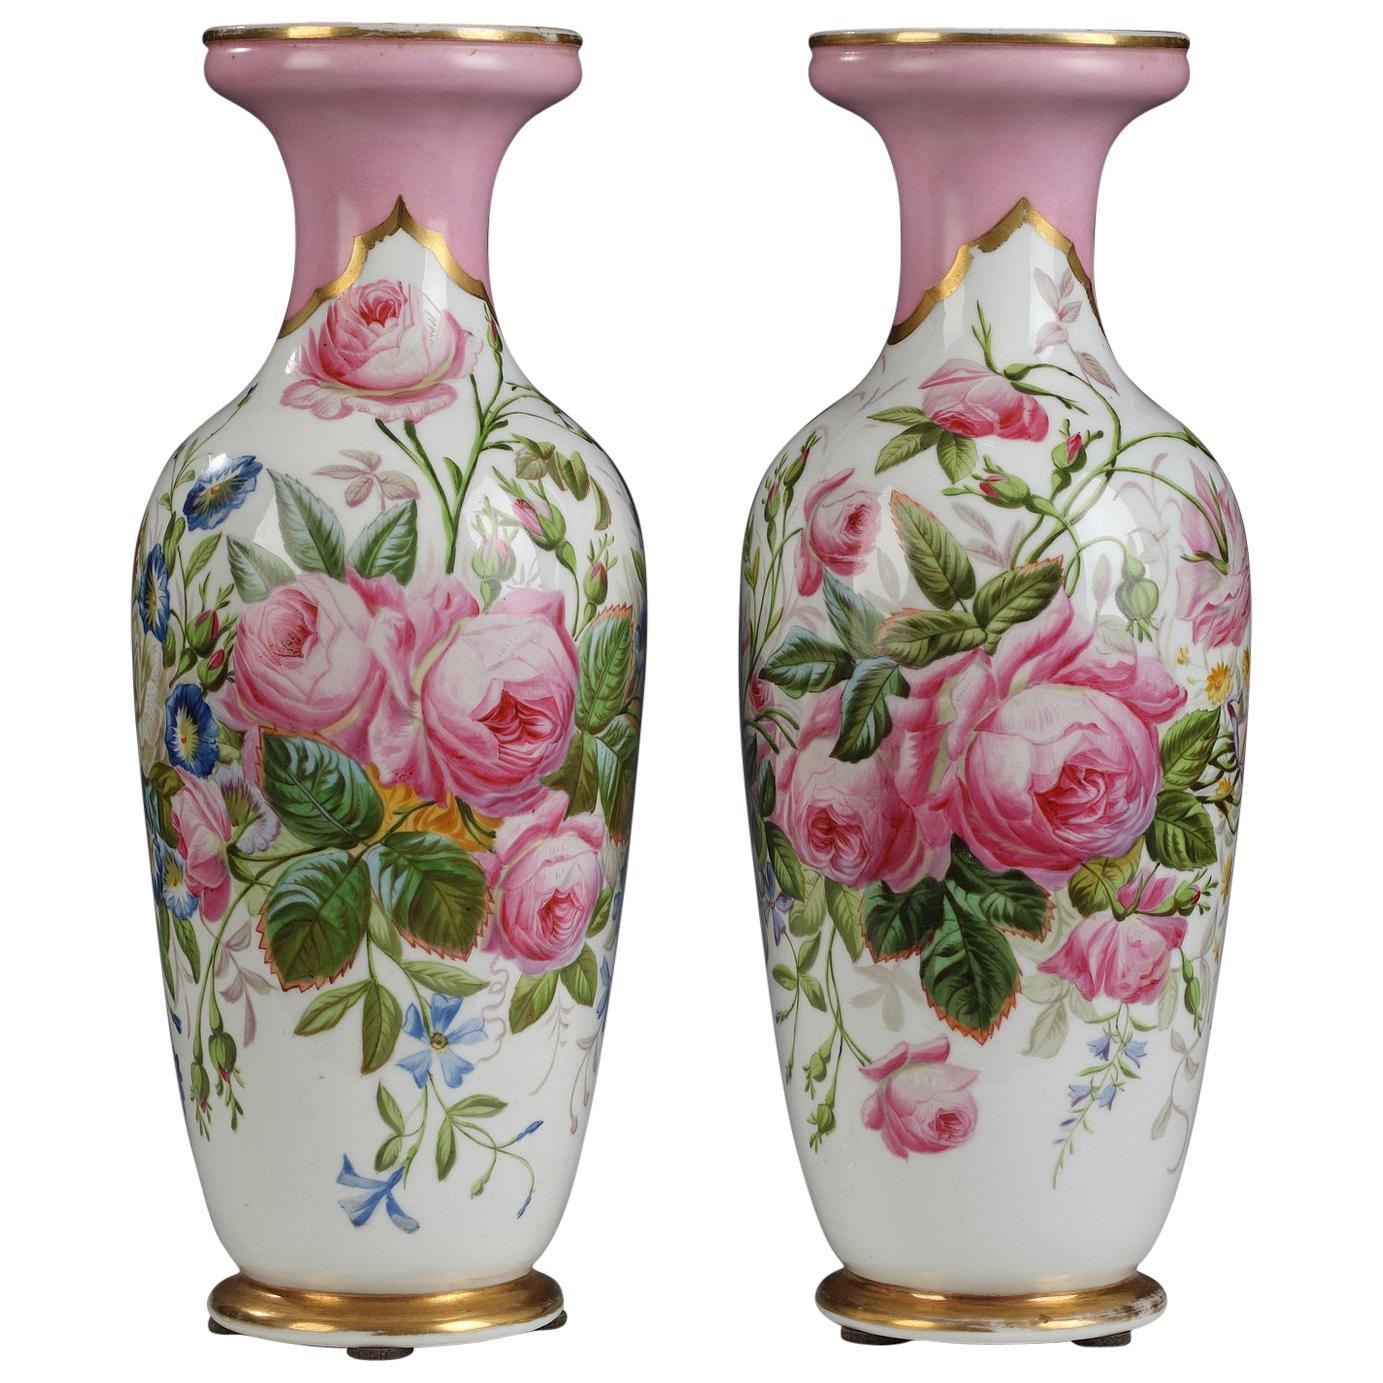 Charming Pair of Vases by Paris Porcelain